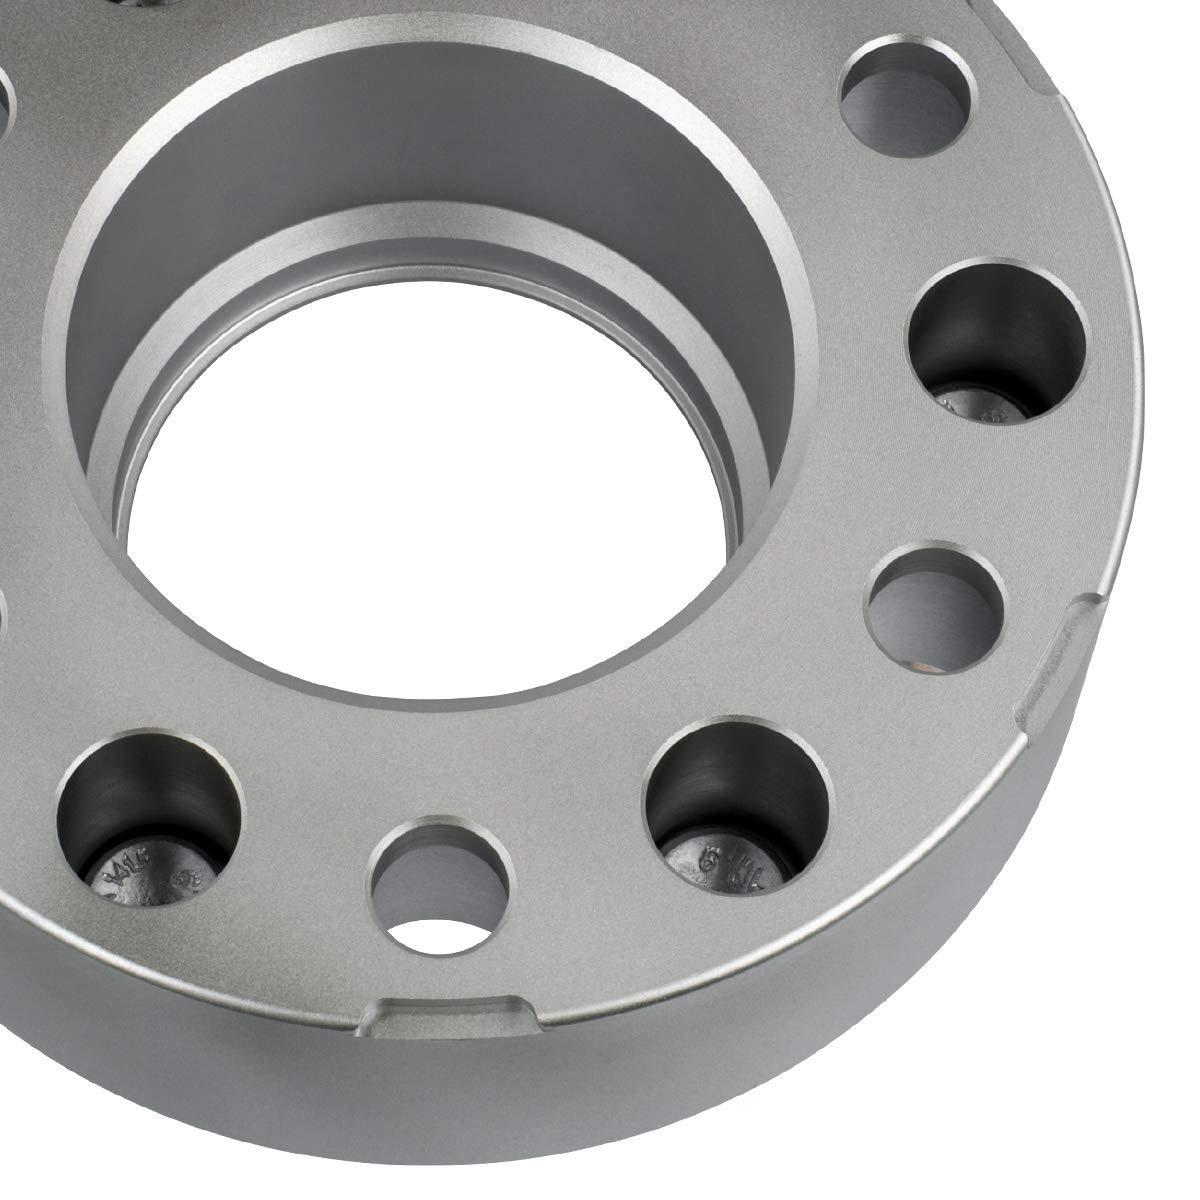 6x139.7mm 4pc 1999-2018 Chevy Silverado 1500 1.5 Hub Centric Wheel Spacers 6x5.5 M14x1.5 Studs Black Supreme Suspensions - with Lip